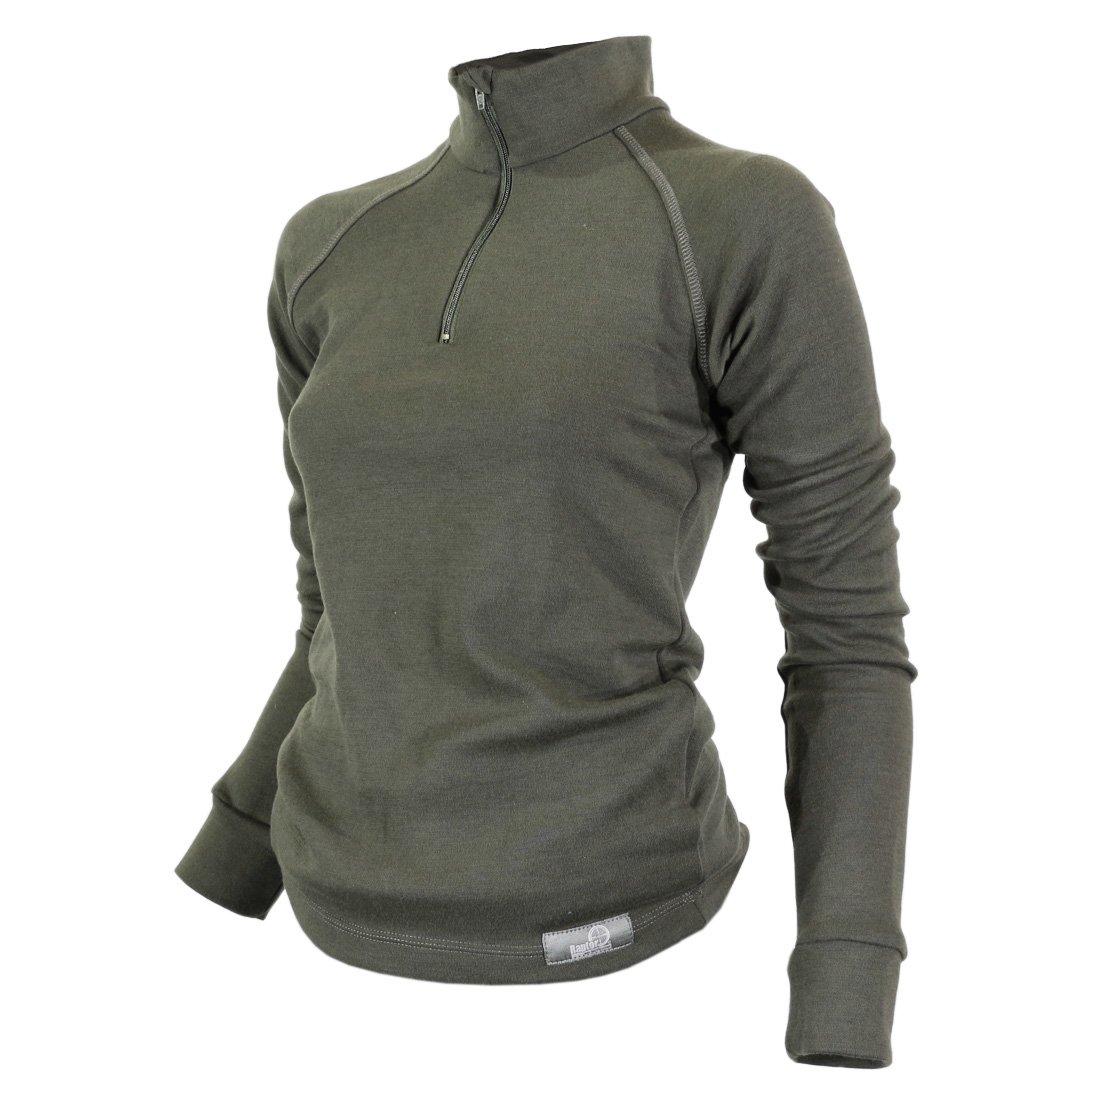 Raptor Hunting Solutions Merino Wool Thermal Ladies Underwear Base Layer Top Long Sleeve Zip Collar Shirt Green